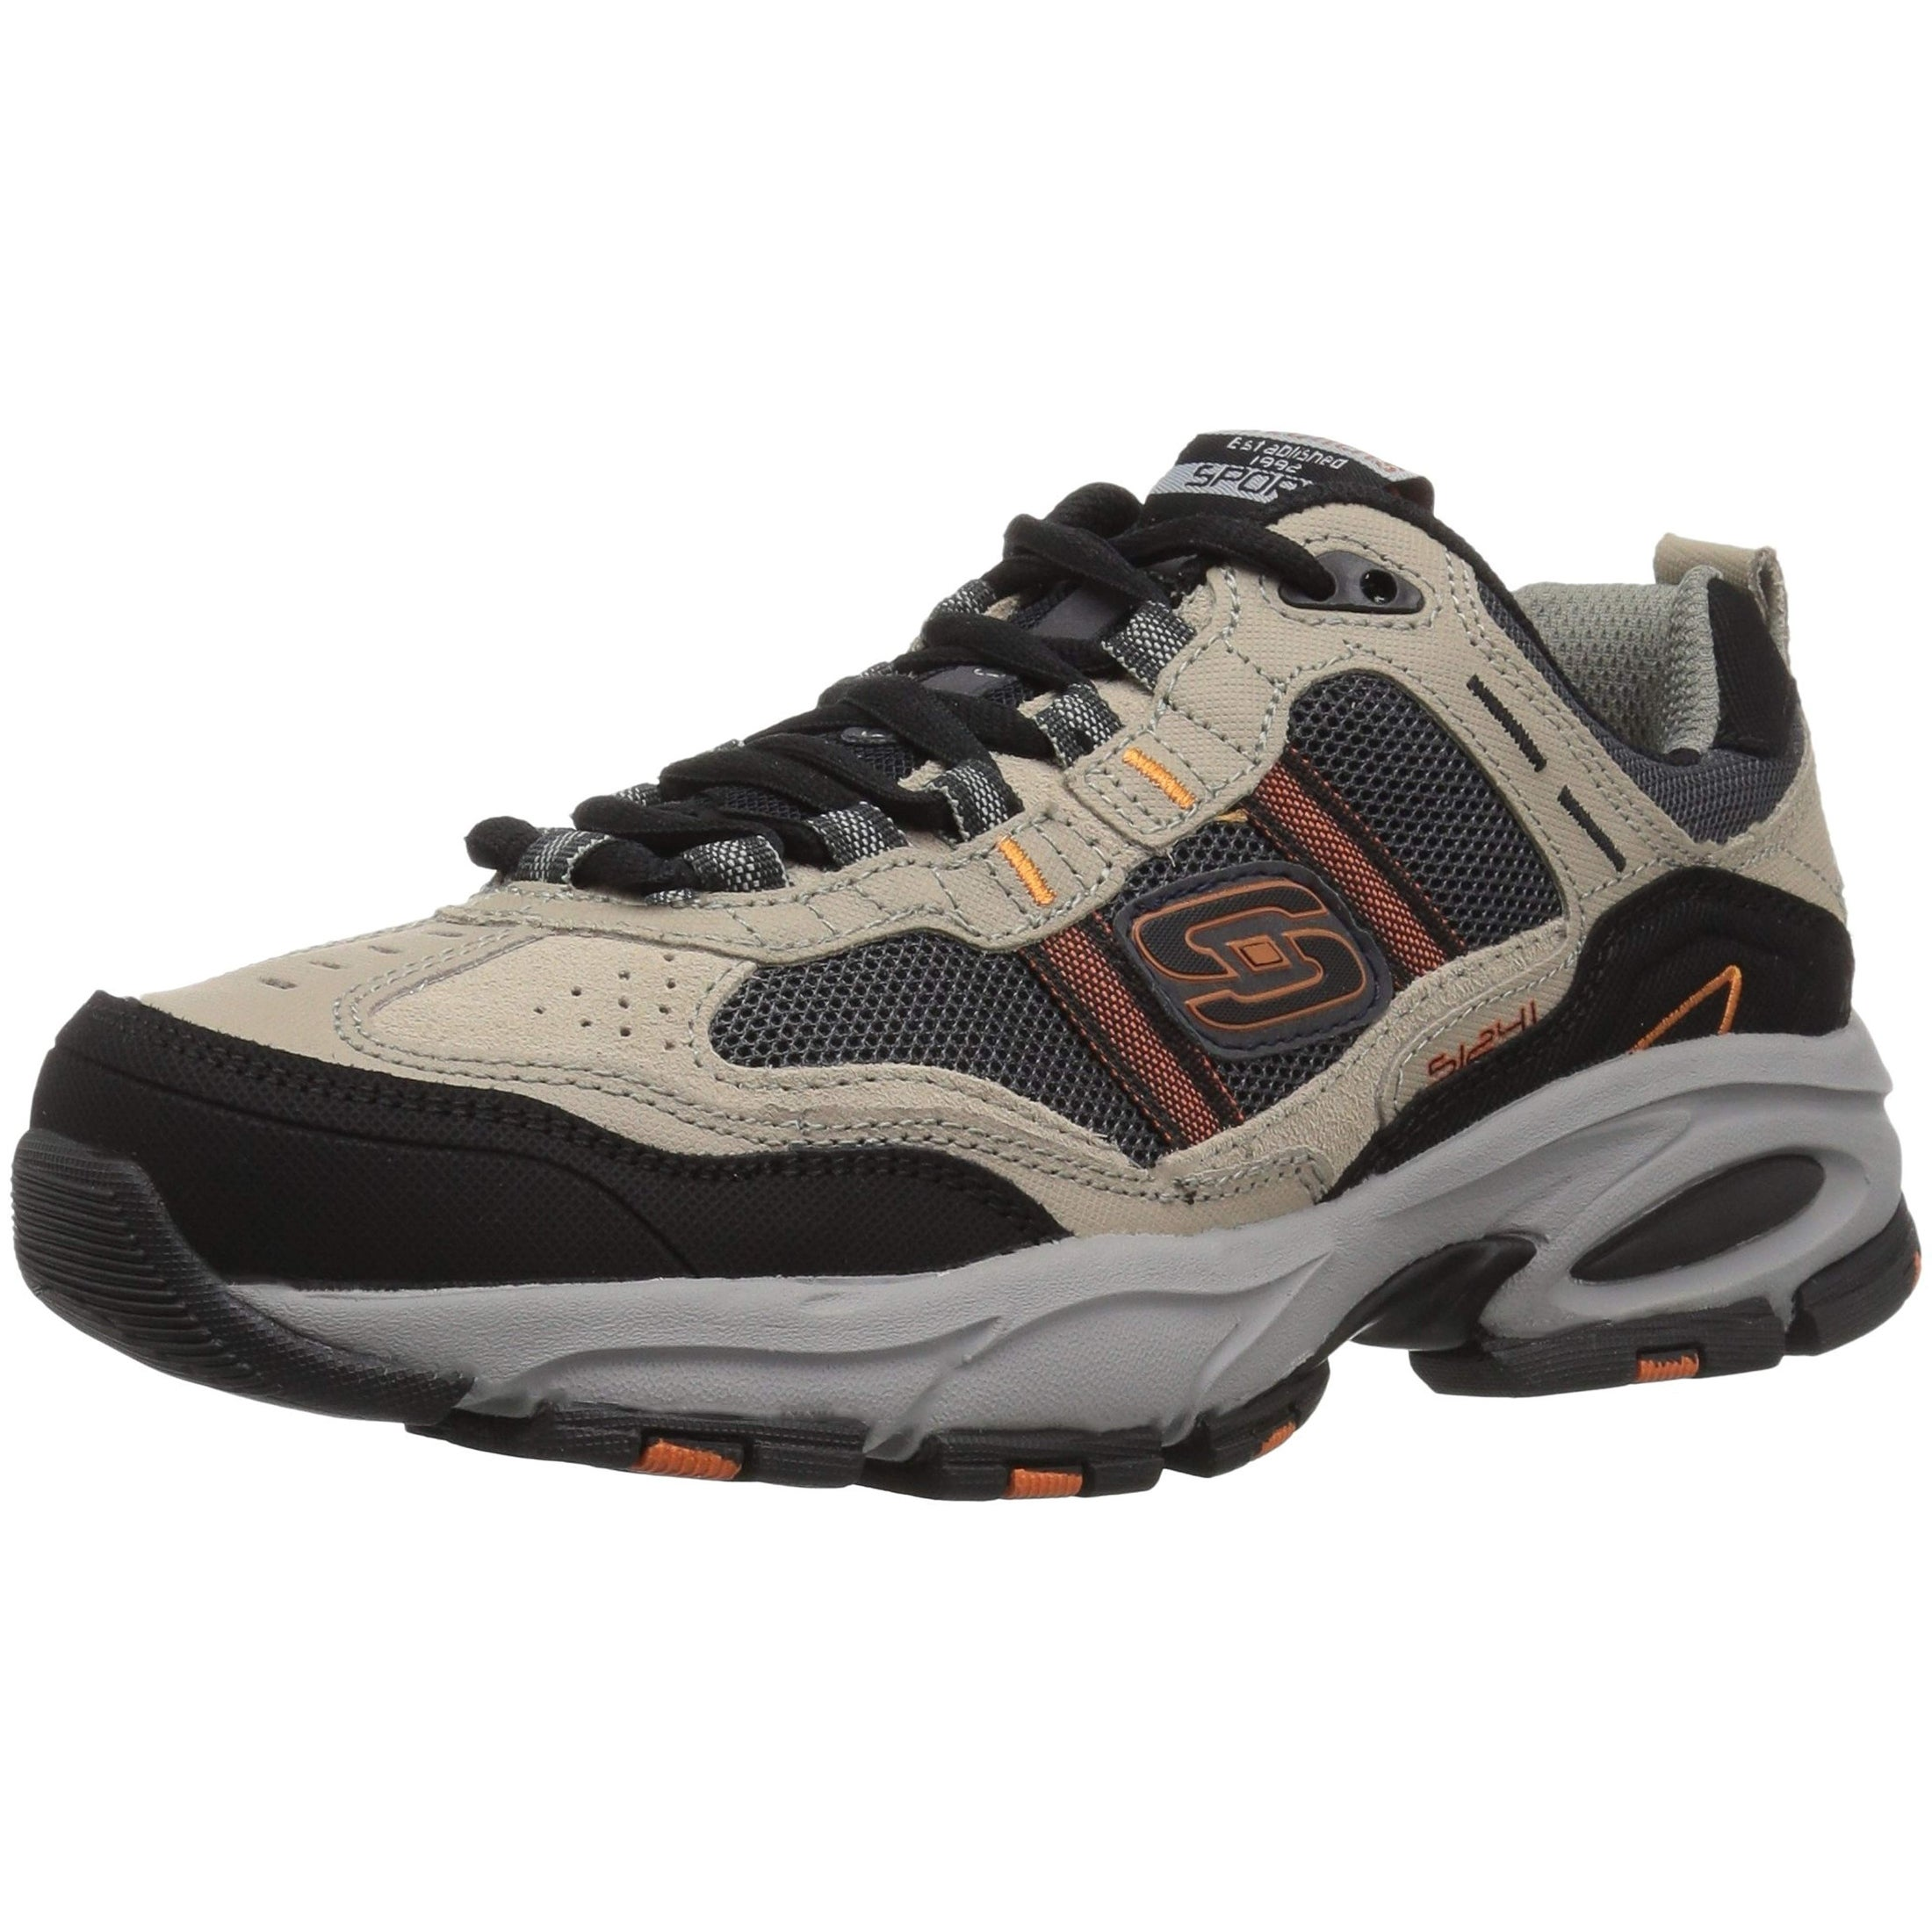 afd54458508ed Shop Skechers Sport Men's Vigor 2.0 Trait Memory Foam Sneaker, Taupe/Black  - Free Shipping Today - Overstock - 27125701